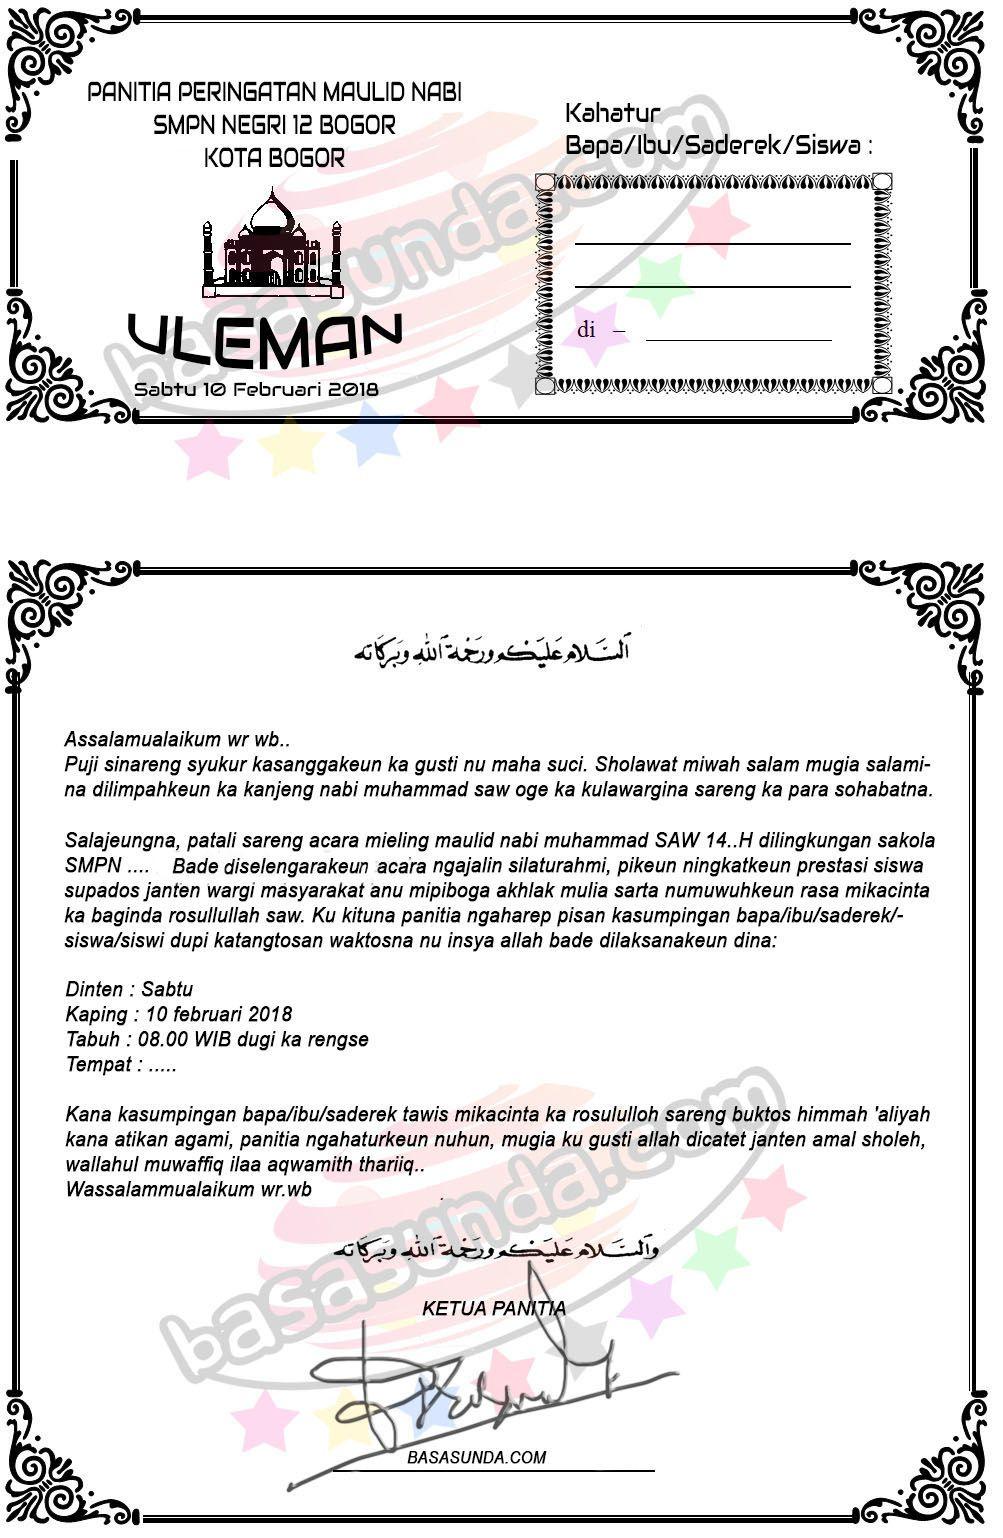 Contoh Surat Resmi Undangan Isra Mi'raj Maulid Nabi Bahasa